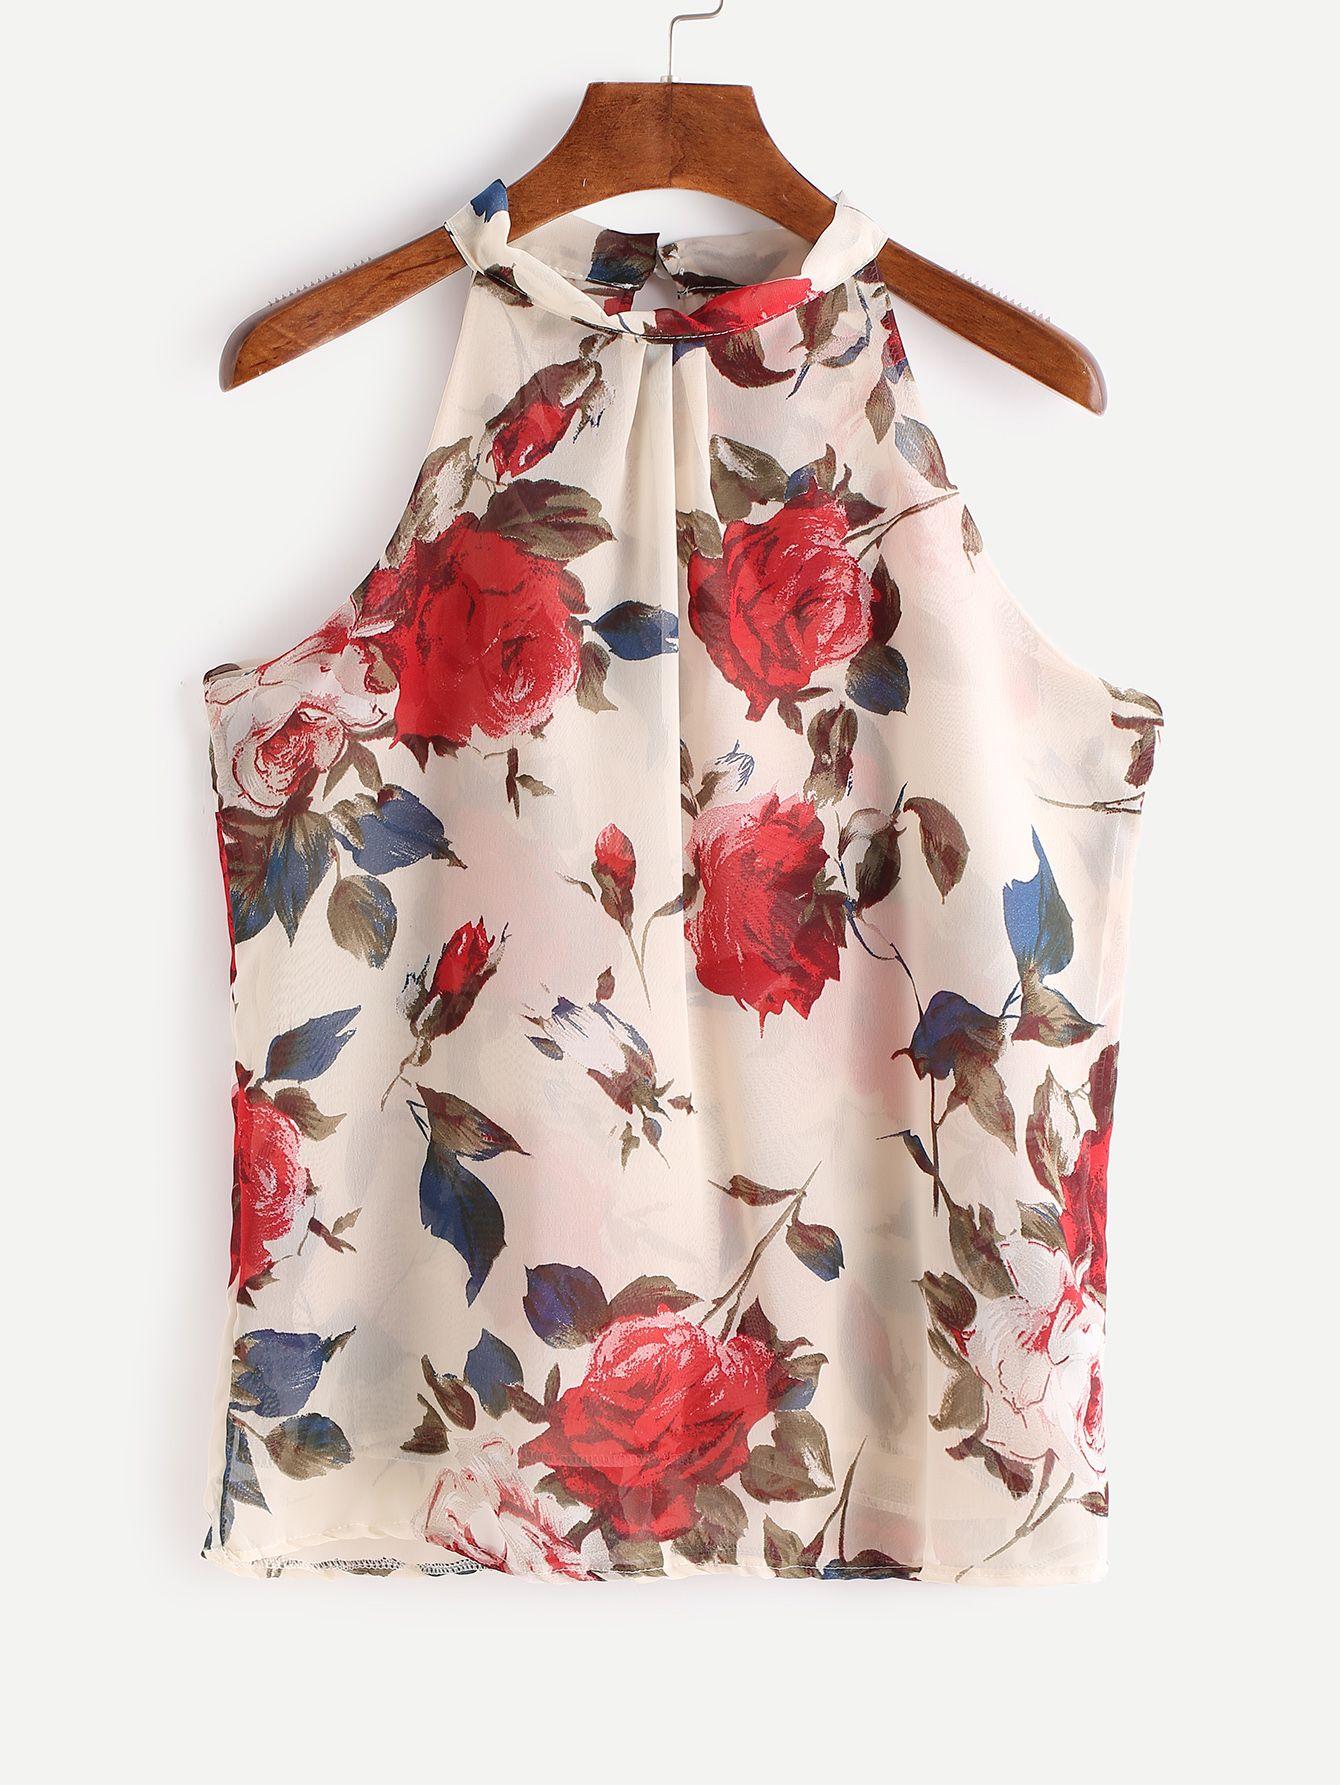 b532d724b0e2 Top de chifón sin mangas con estampado floral-(Sheinside) | Tops en ...